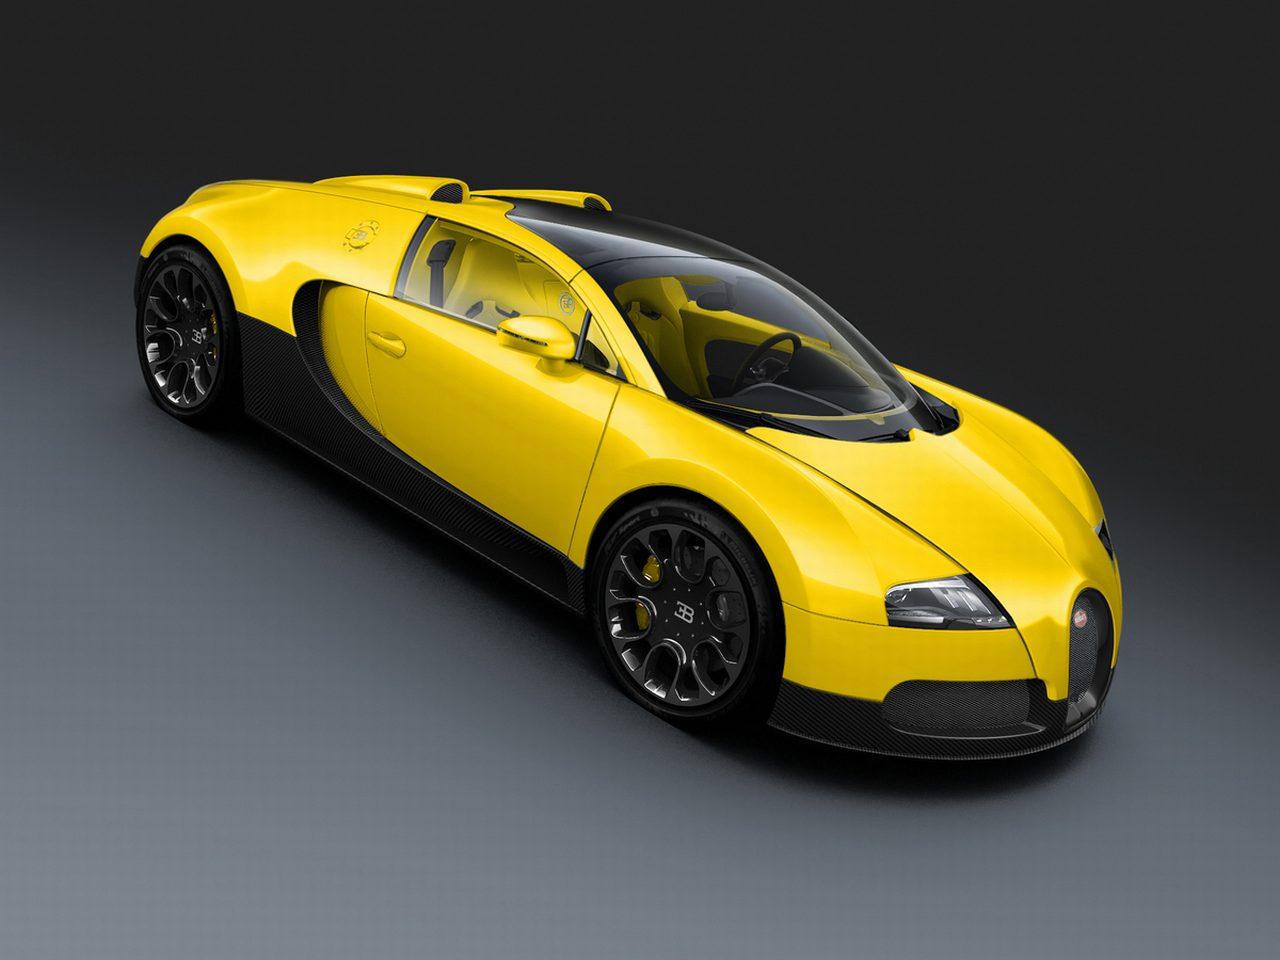 Bugatti_Veyron_Grand_Sport_Yellow_Carbon-01.jpg